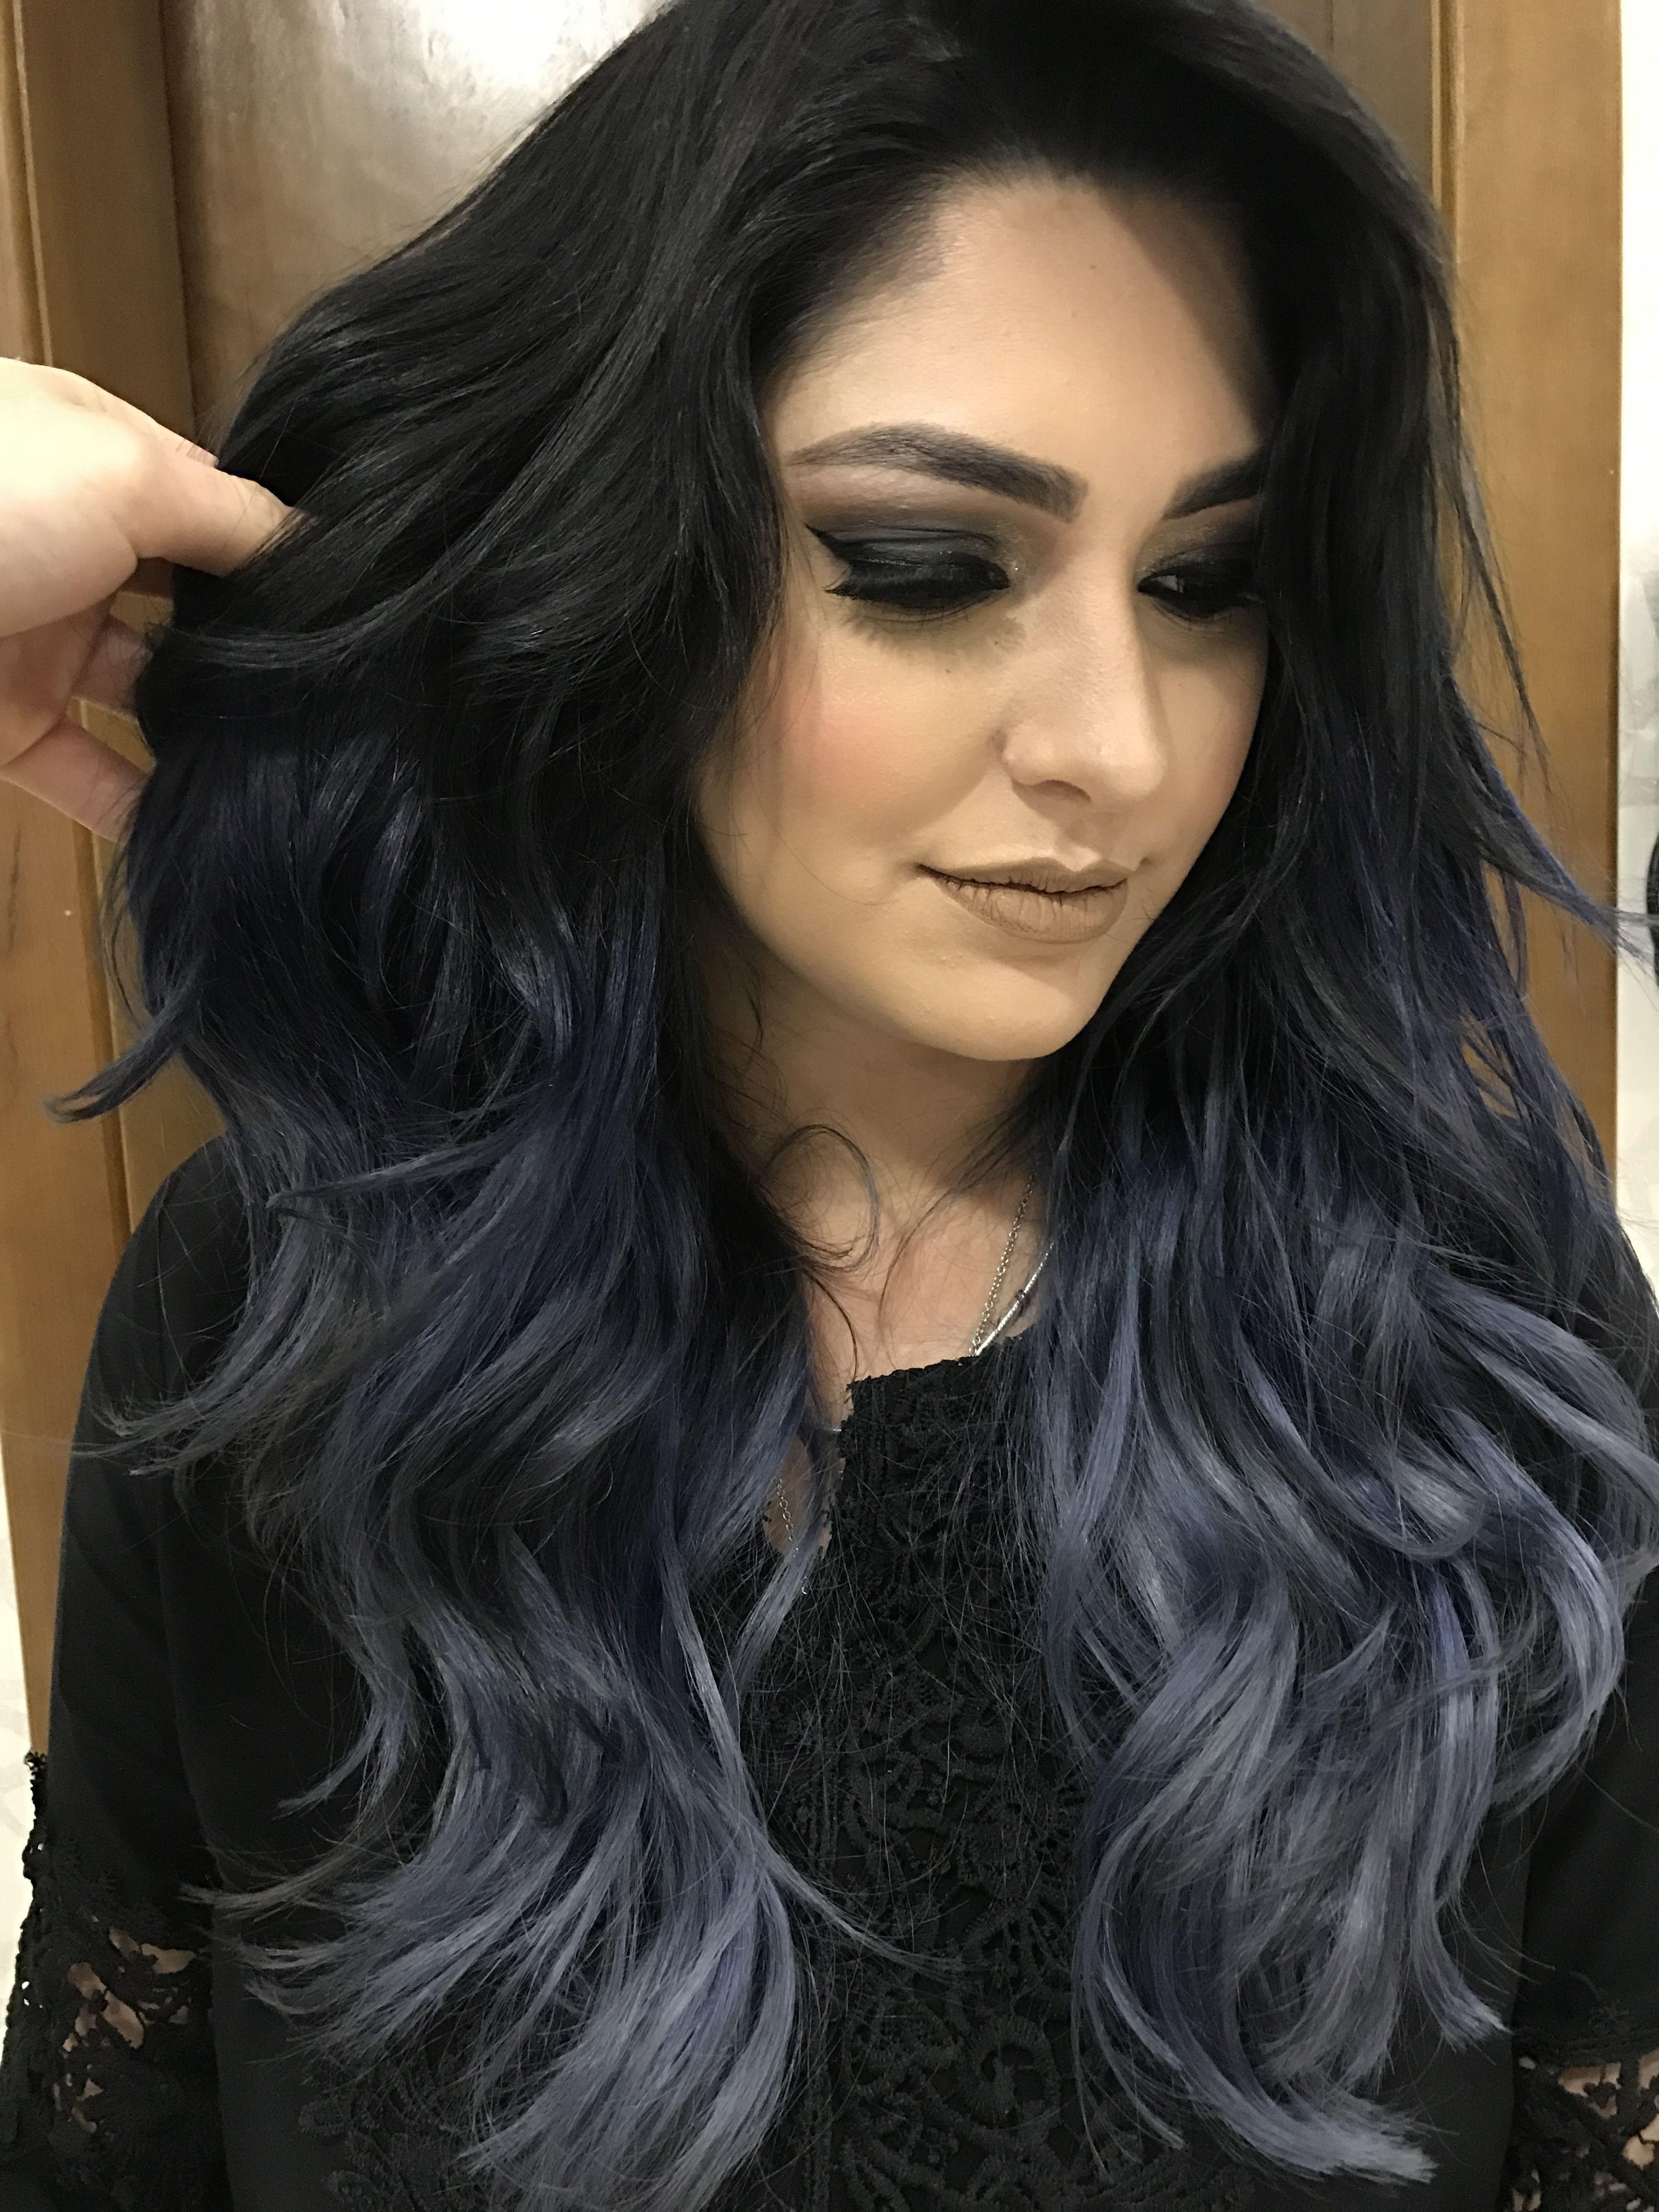 Charcoal Hair Tendncia Para Um Visual Estiloso Aposte In Silver Queen Montes 50g Beautiful